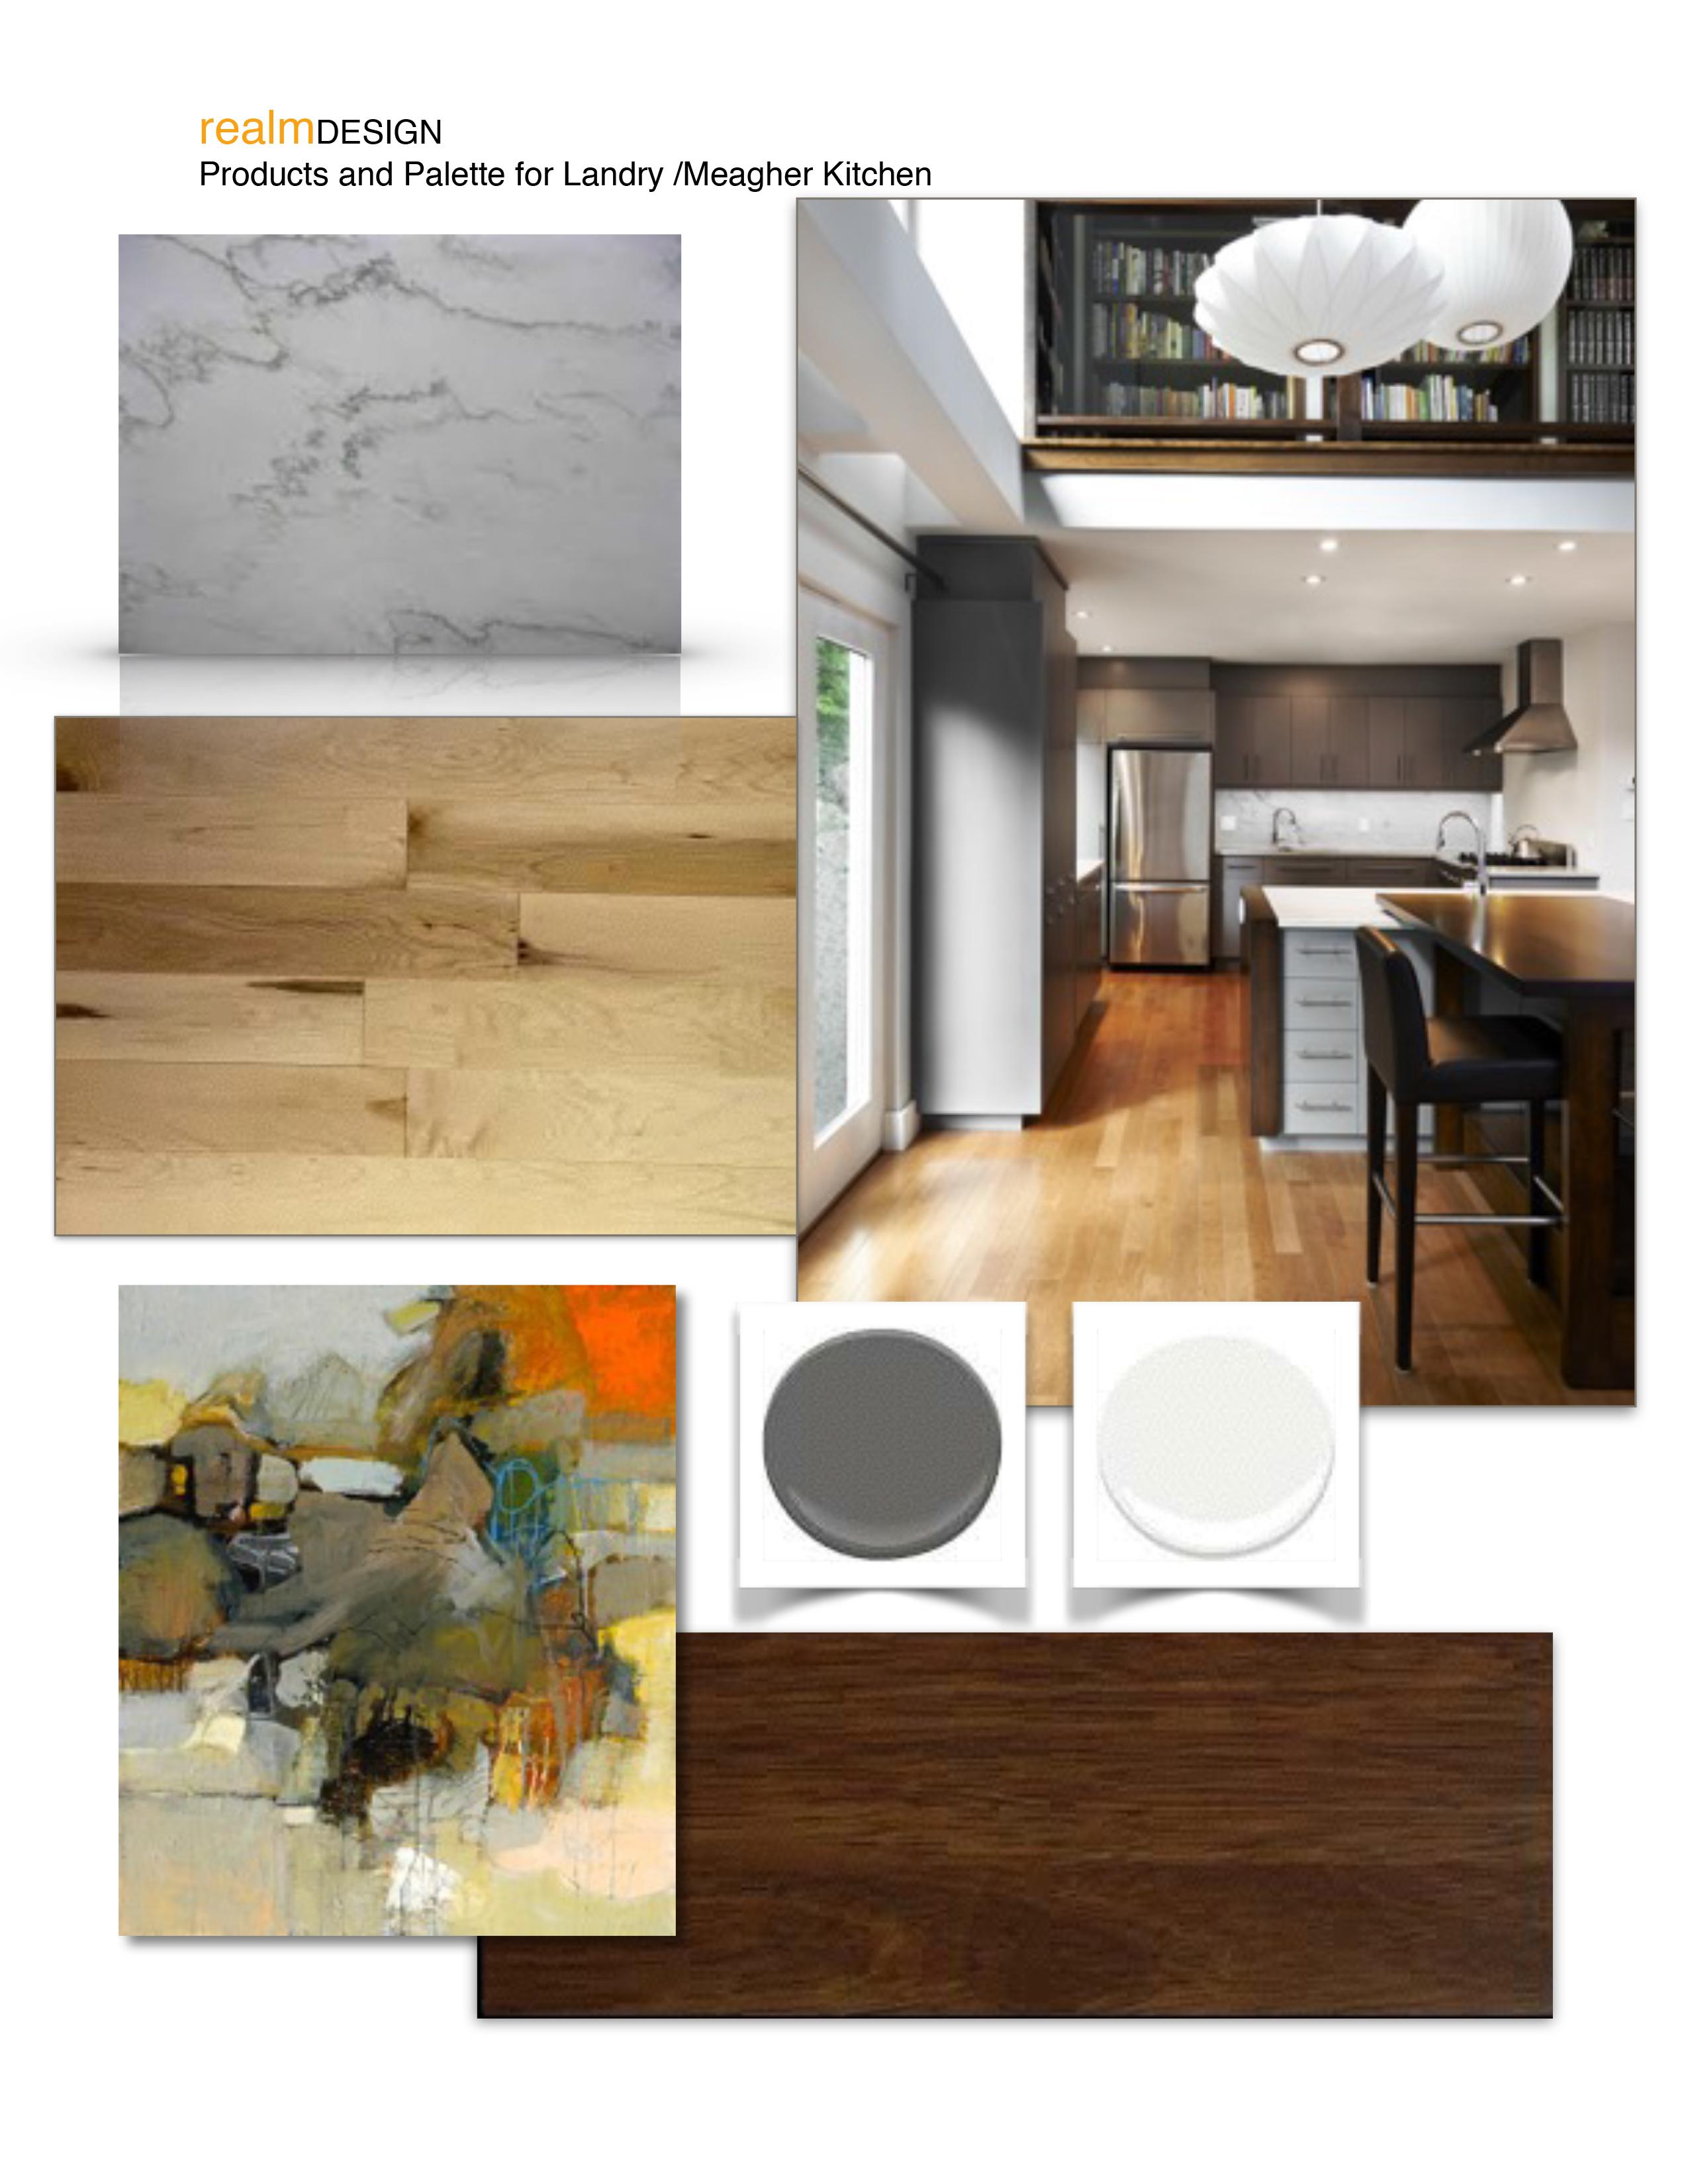 Landrey Meagher Kitchen Palette.jpg